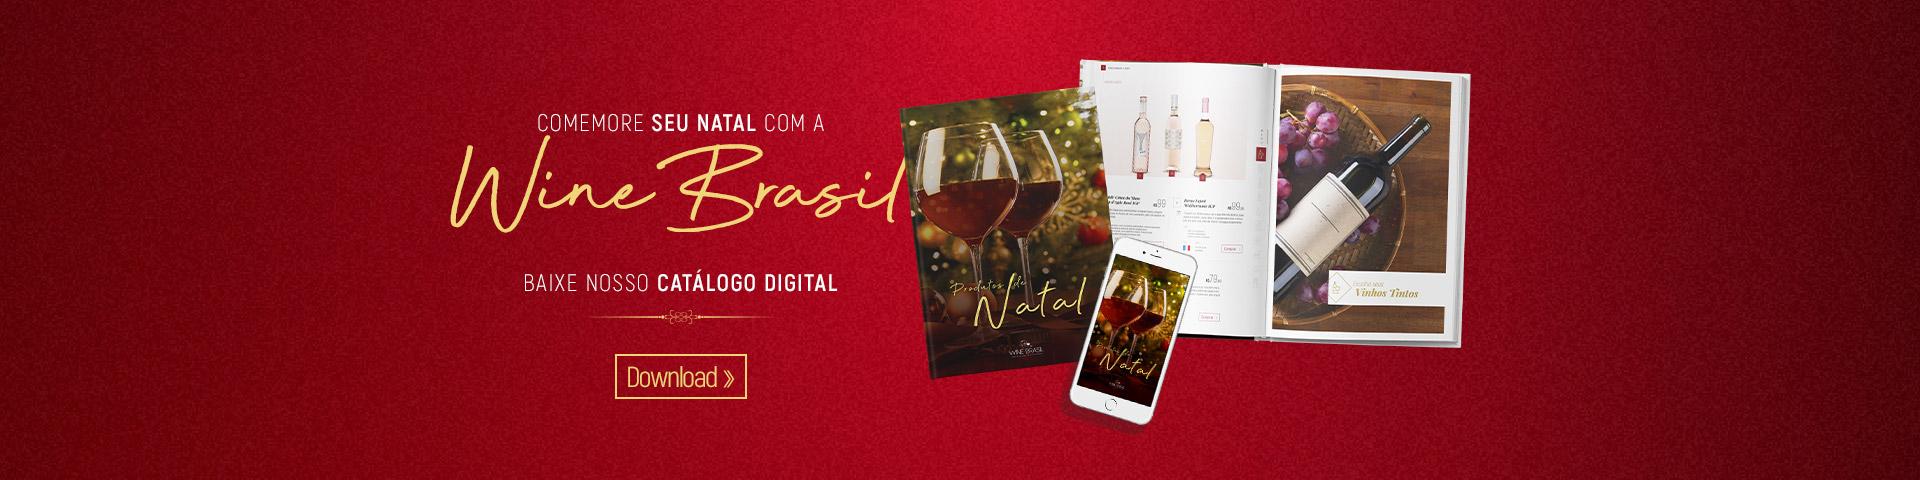 Catálogo de Natal 2019 - Wine Brasil